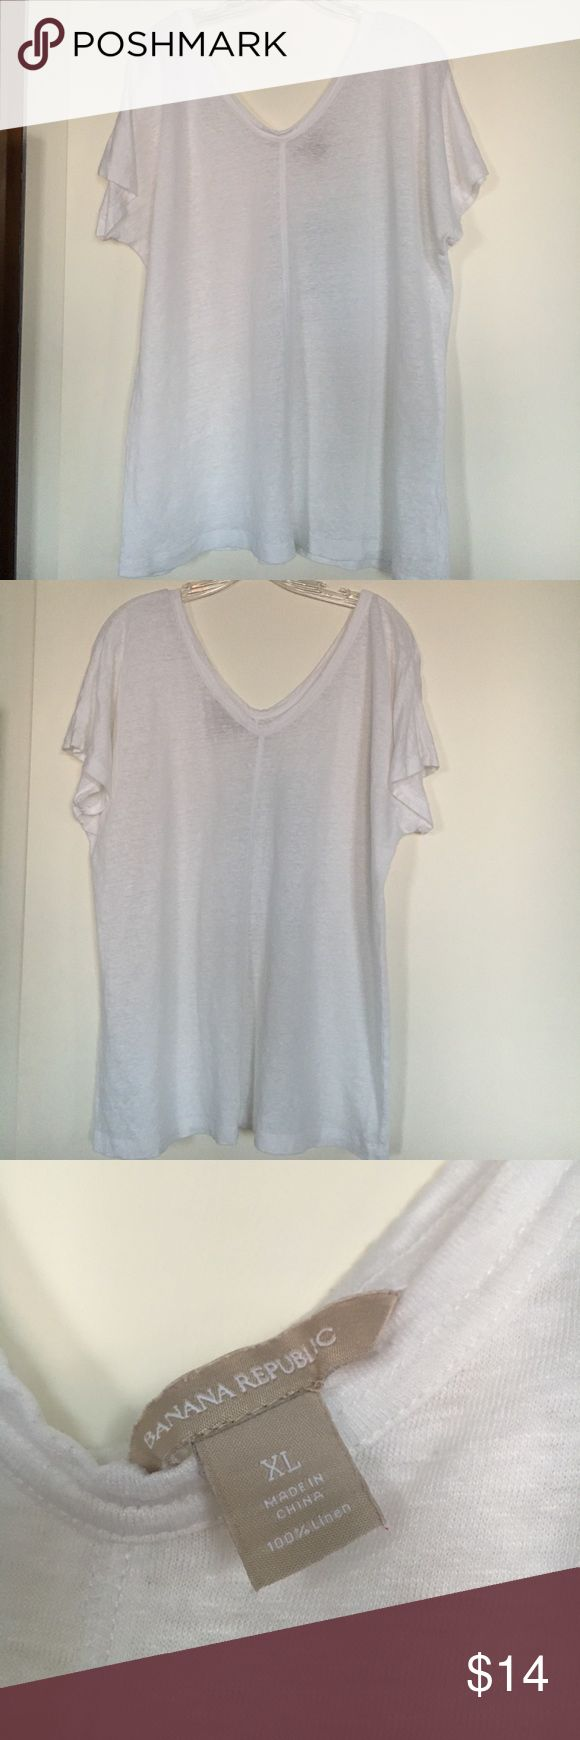 Banana Republic Linen t-shirt XL White linen t-shirt. Great condition. Short sleeves. Slouchy Banana Republic Tops Tees - Short Sleeve